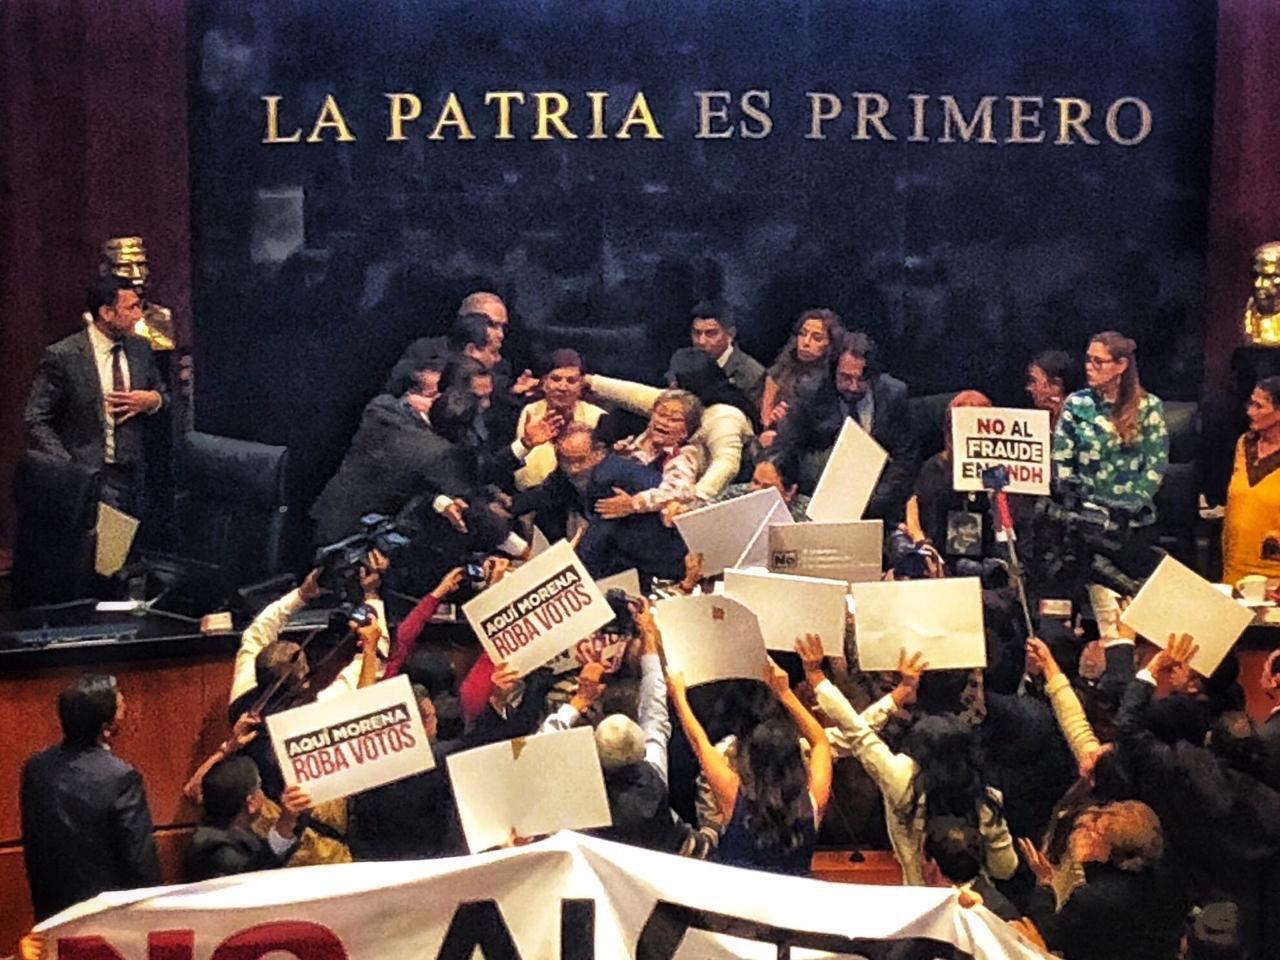 LA-PATRIA-ES-PRIMERO.jpg